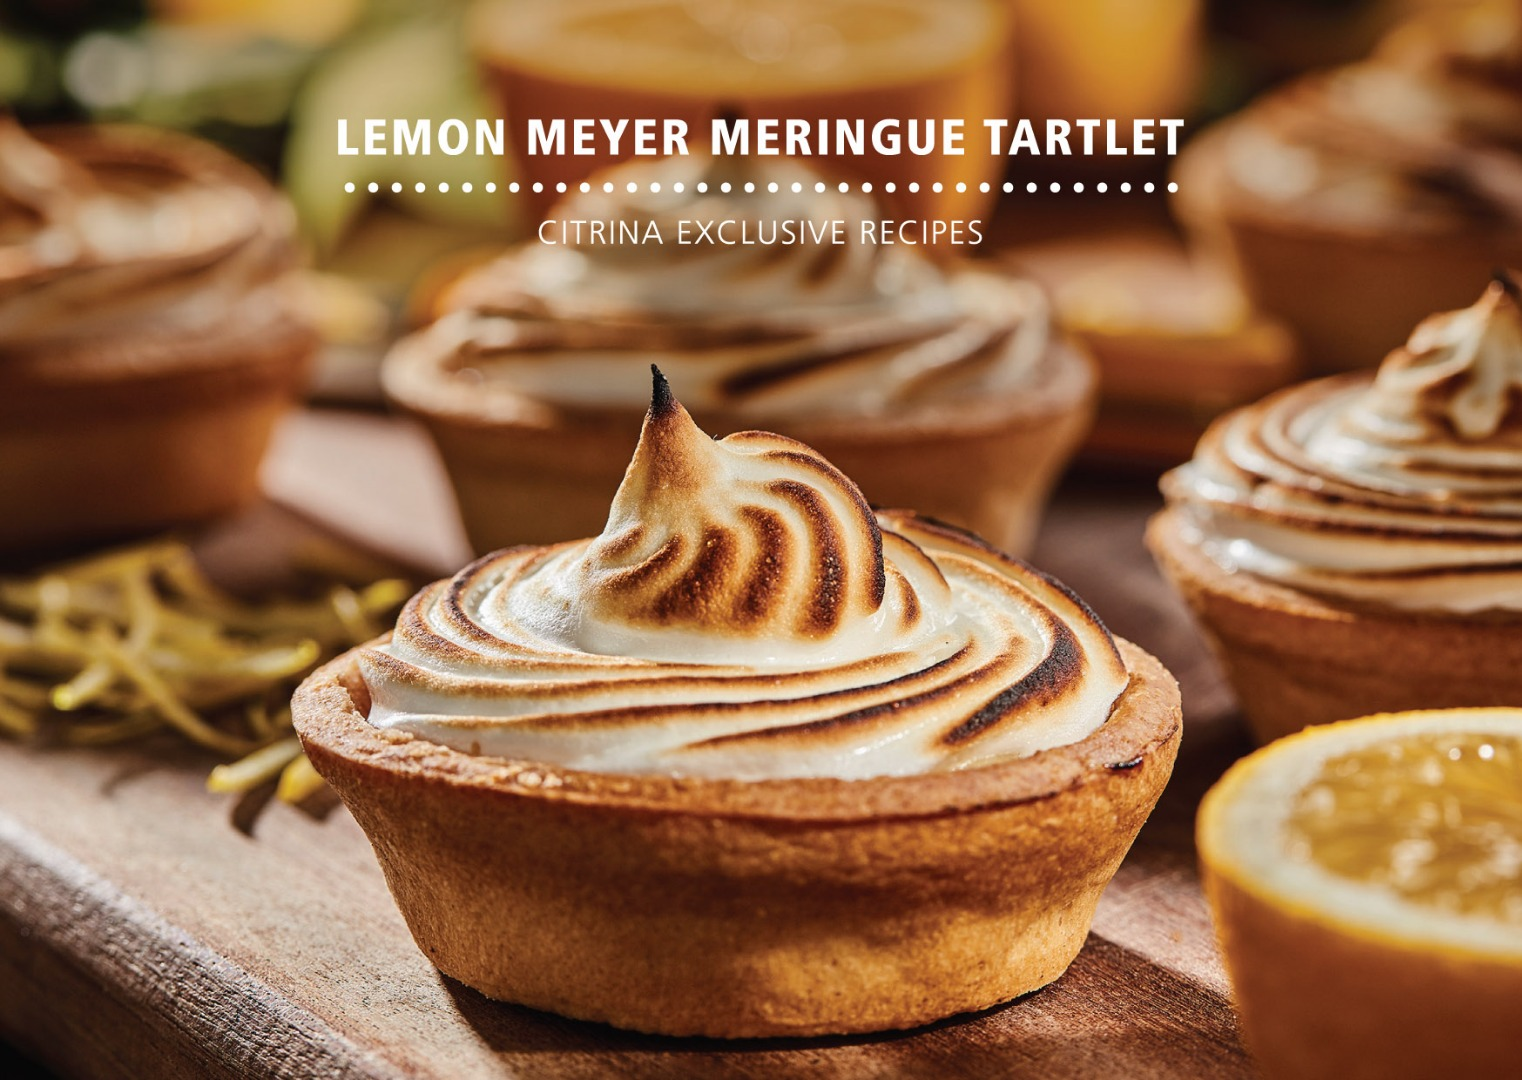 Meyer Lemon - Lisa Tartlet merengue de Limão Meyer